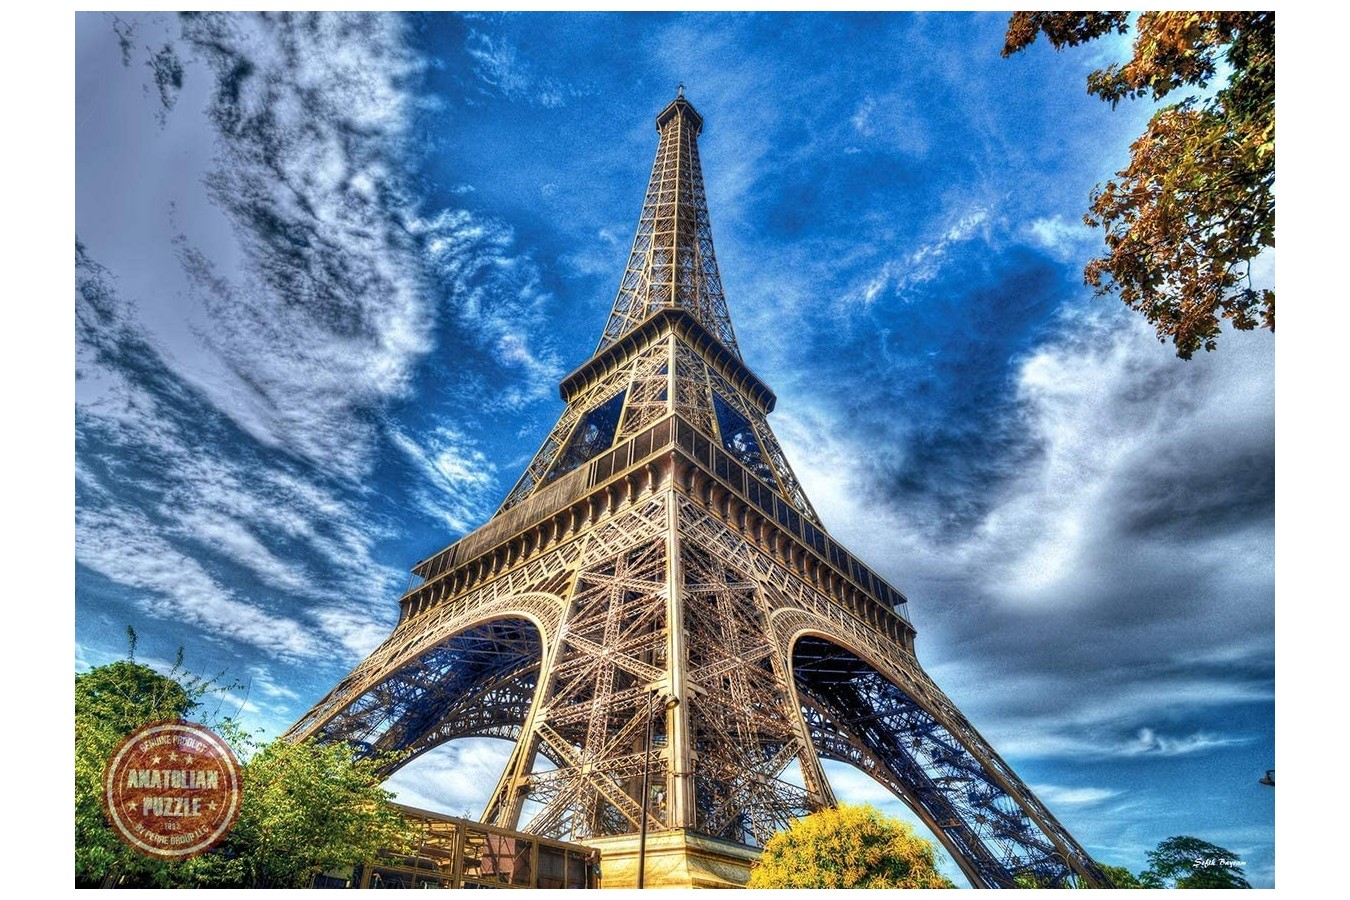 Puzzle Anatolian - Eiffel Tower, 1.000 piese (P1080) imagine